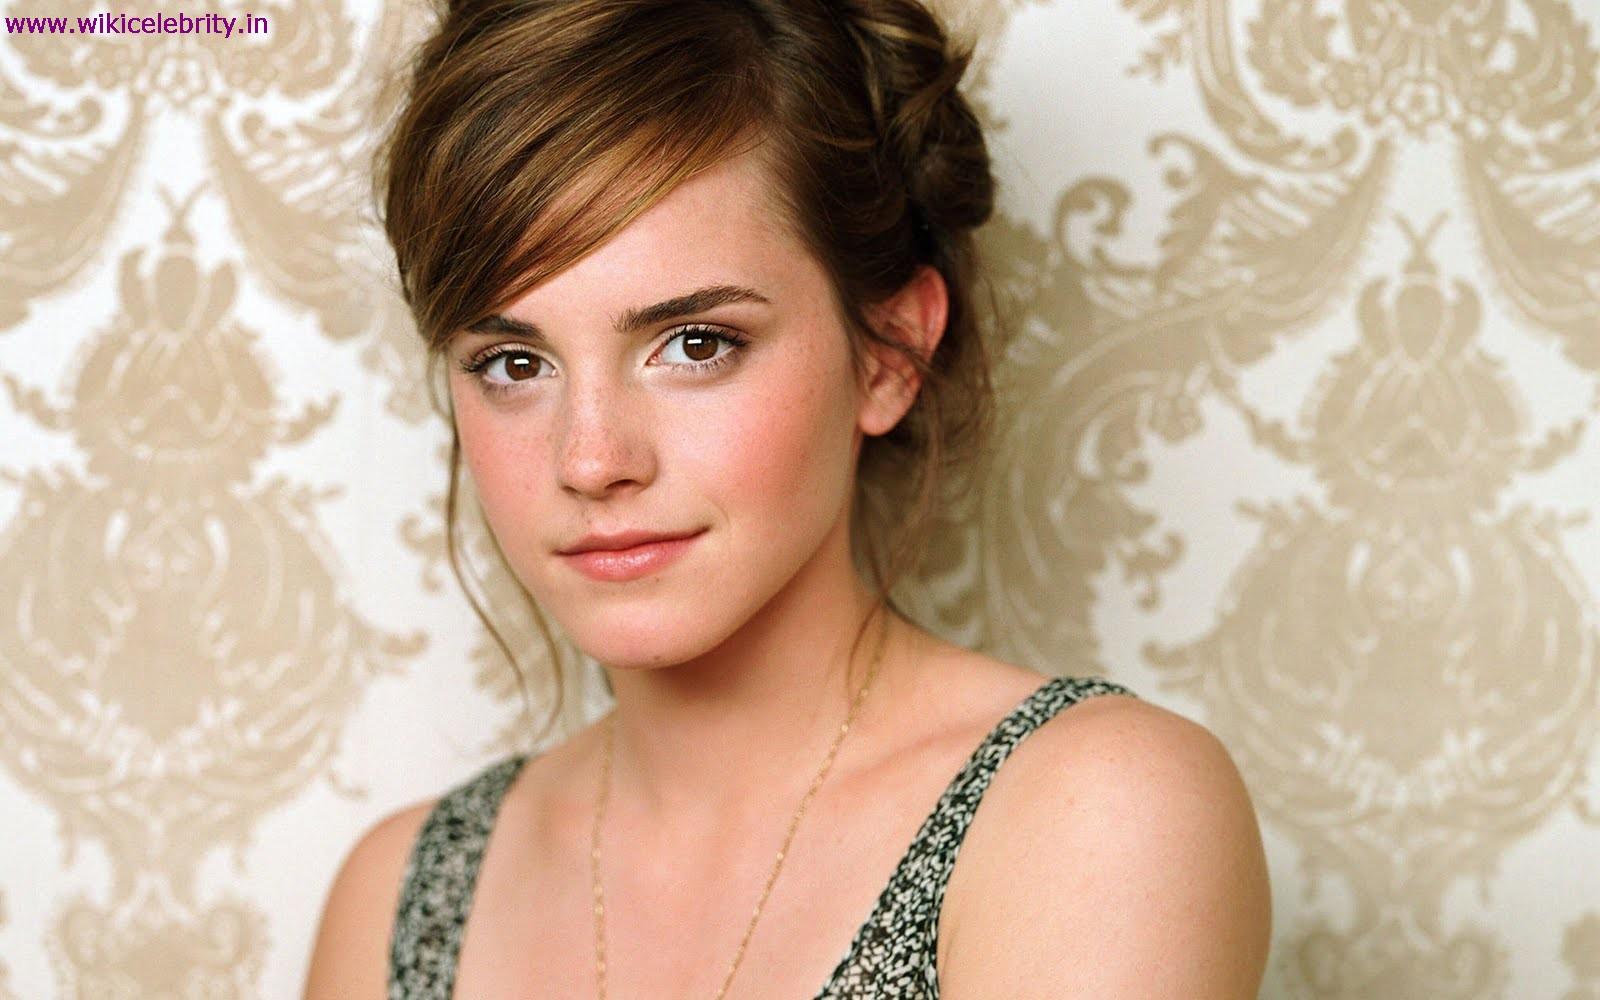 Theatre Blue Films Online Hot Movies Videos Emma Watson HD Wallpapers 1600x1000